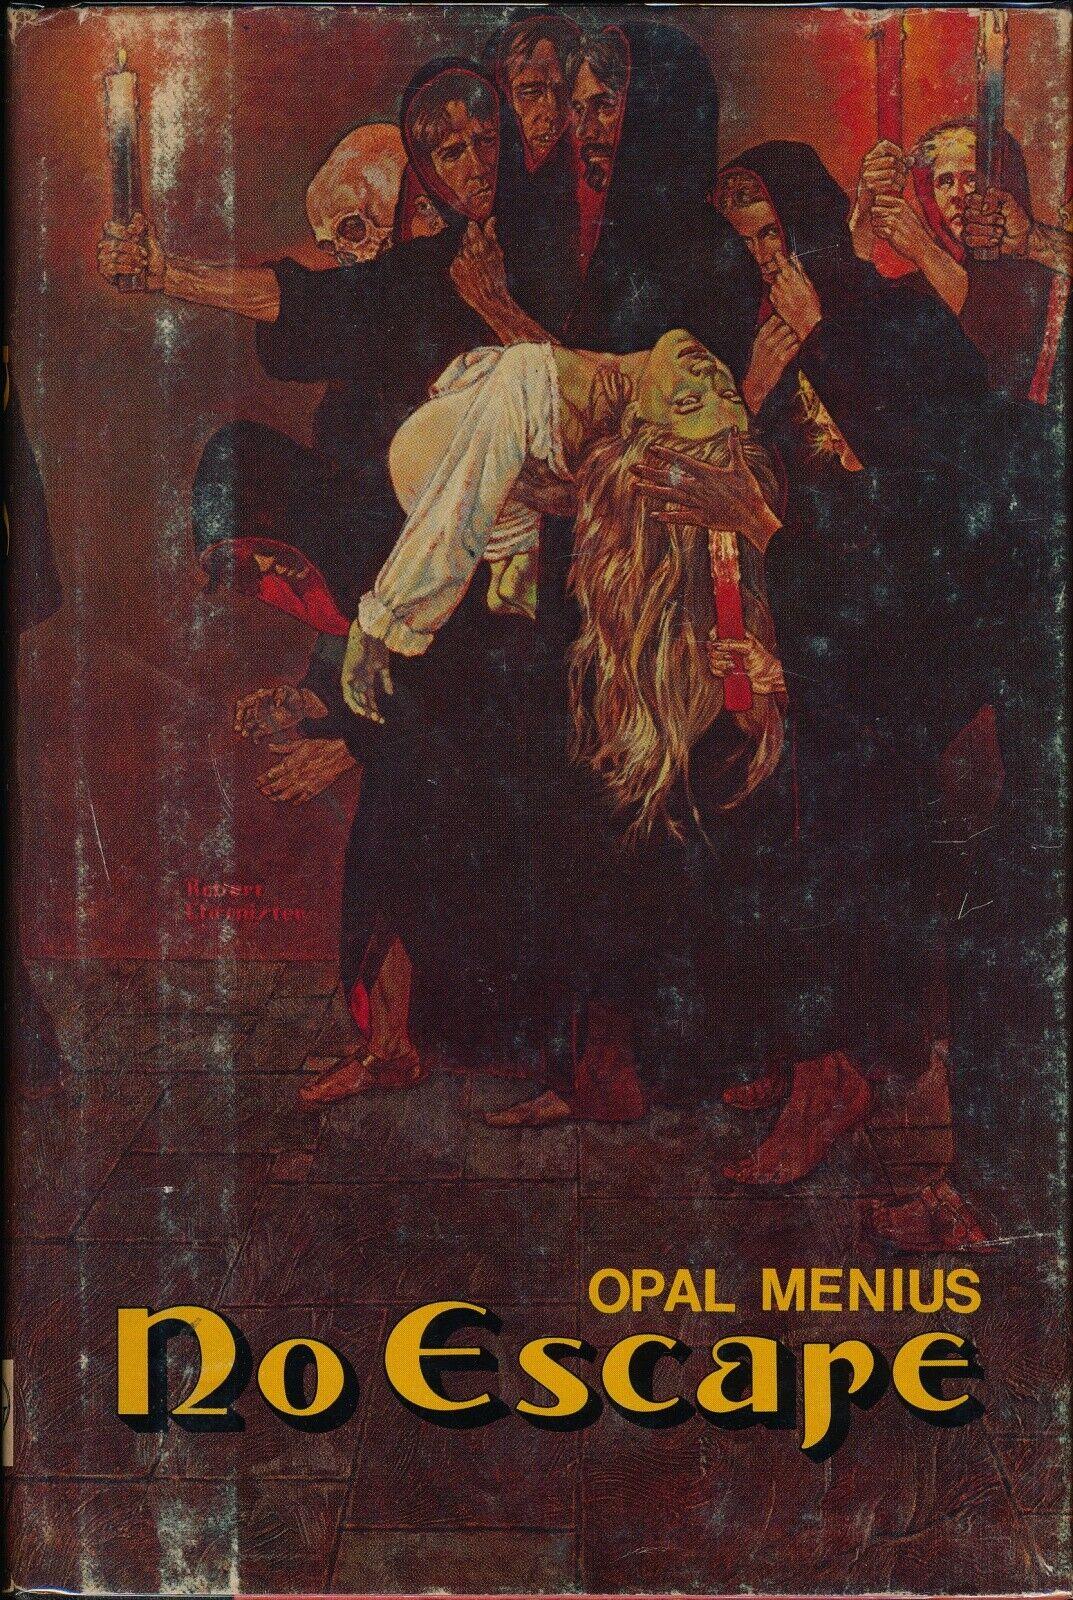 NO ESCAPE Opal Menius 1979 HARDCOVER IN JACKET Occult FLORIDA Georgia 127015 - $20.00